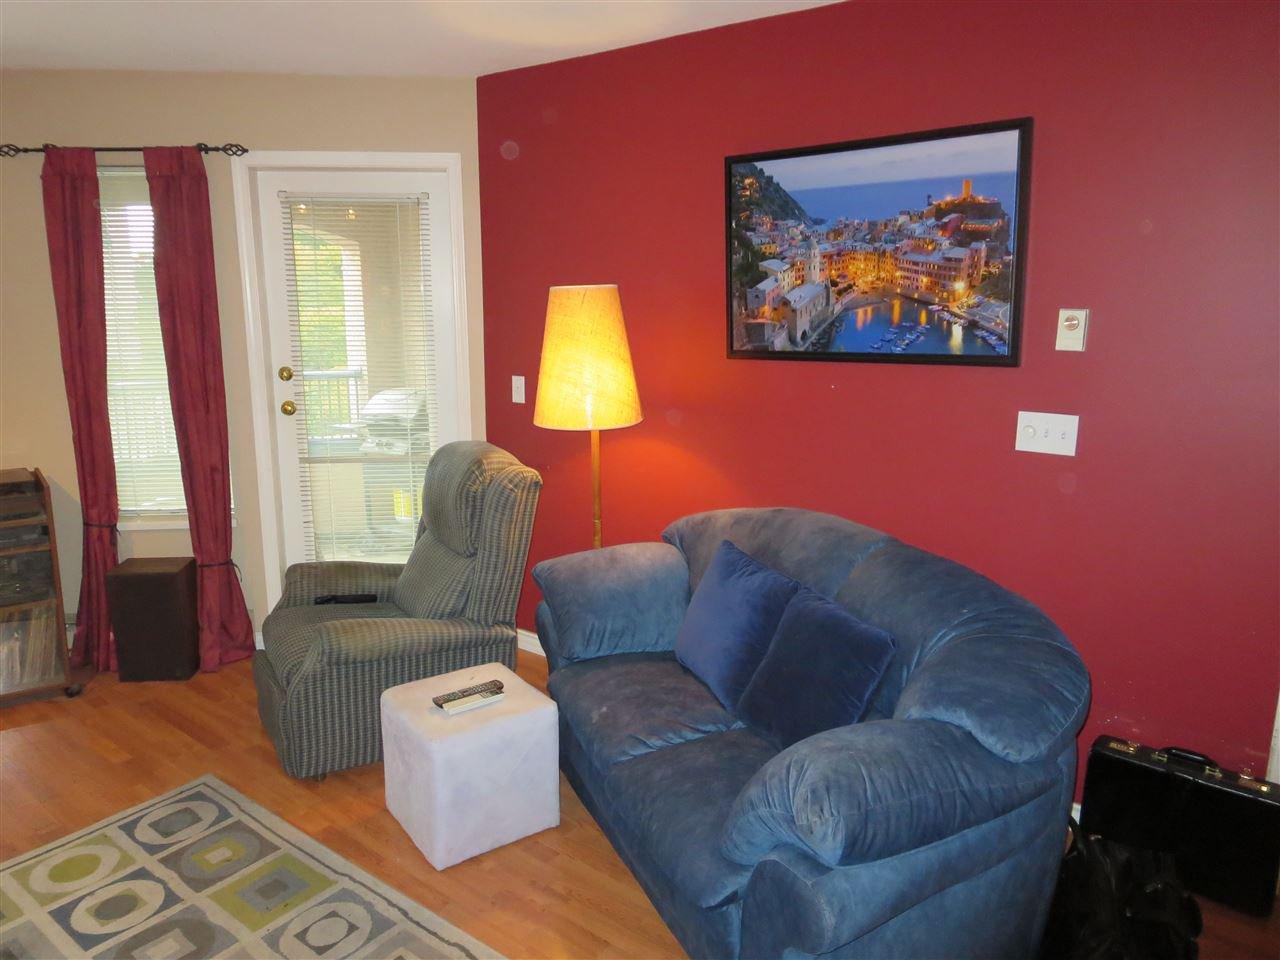 Photo 12: Photos: 317 98 LAVAL Street in Coquitlam: Maillardville Condo for sale : MLS®# R2117700